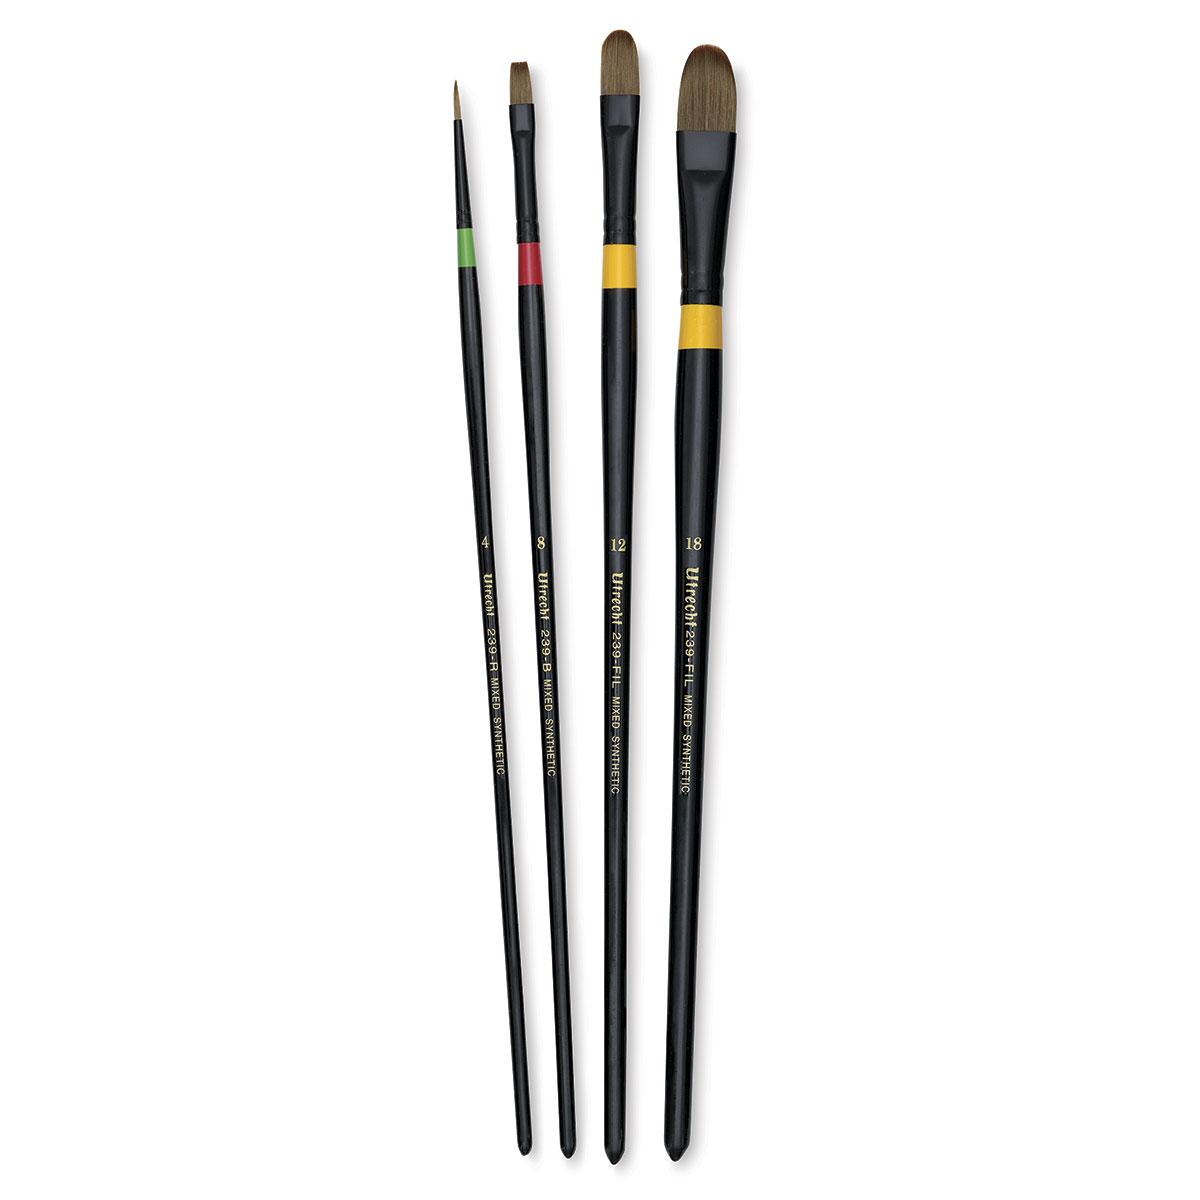 Utrecht Manglon Brushes-Set of 4, Long Handle